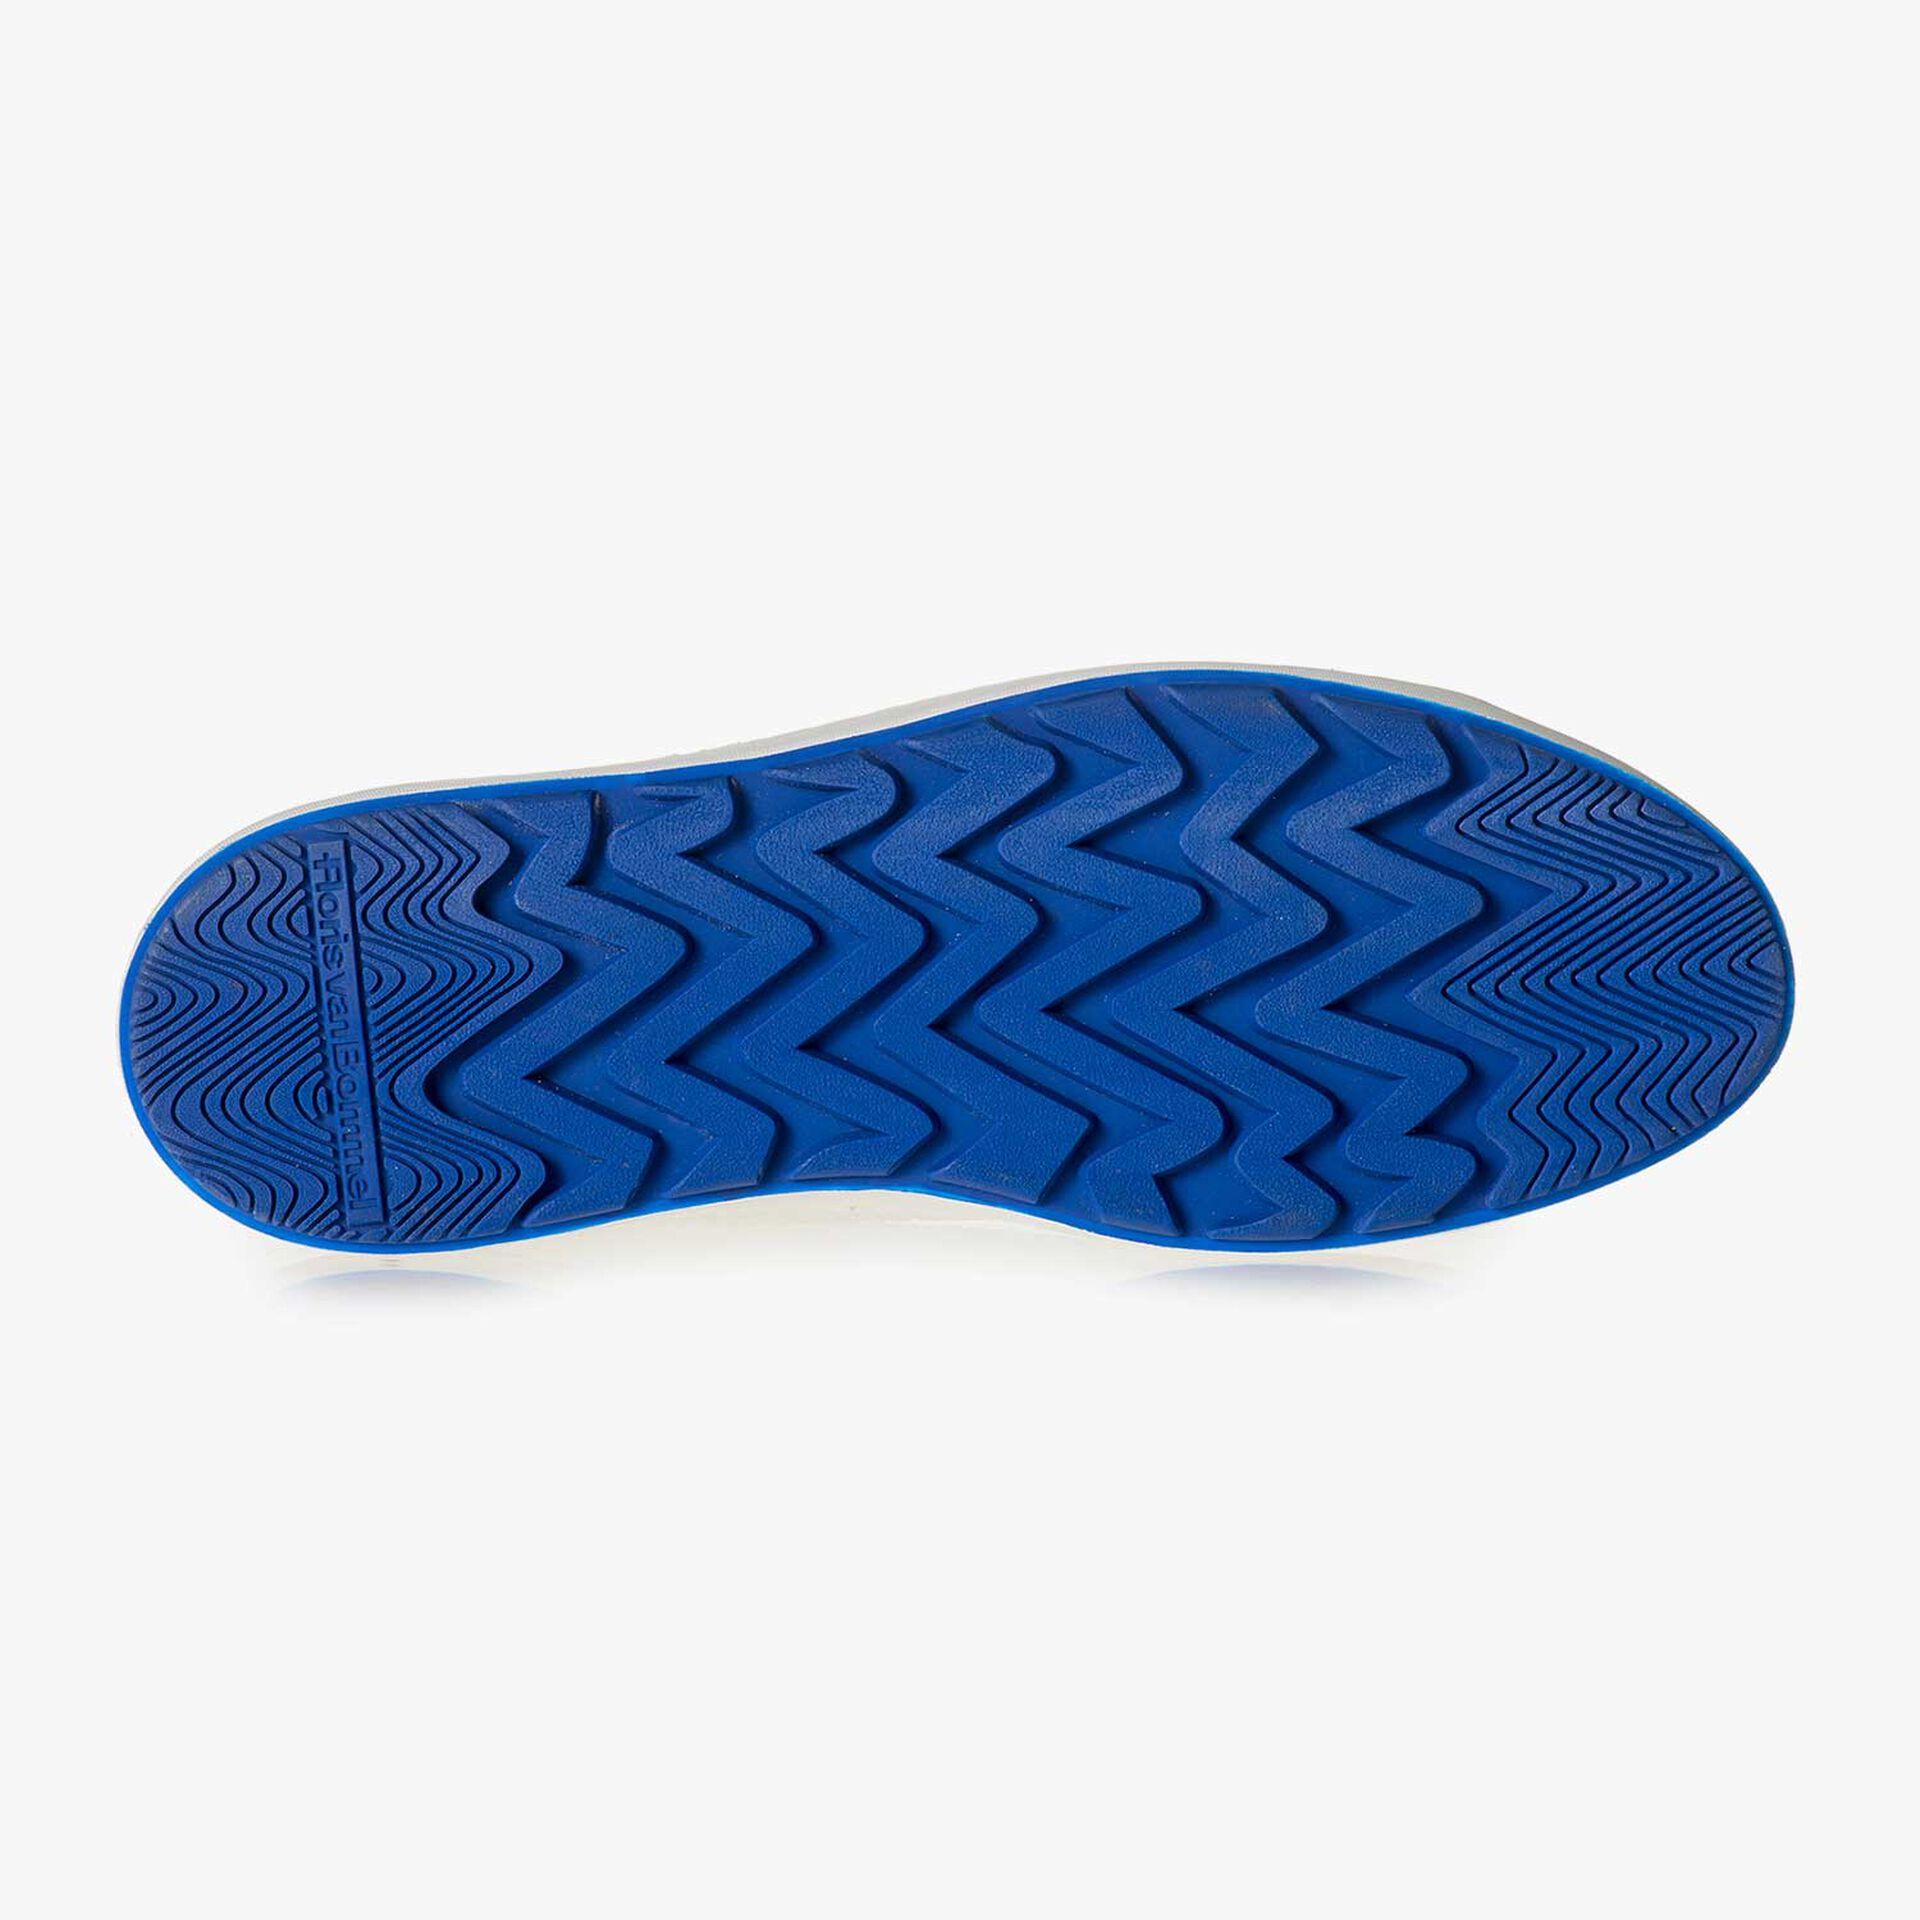 Weißer fein strukturierter Leder-Sneaker